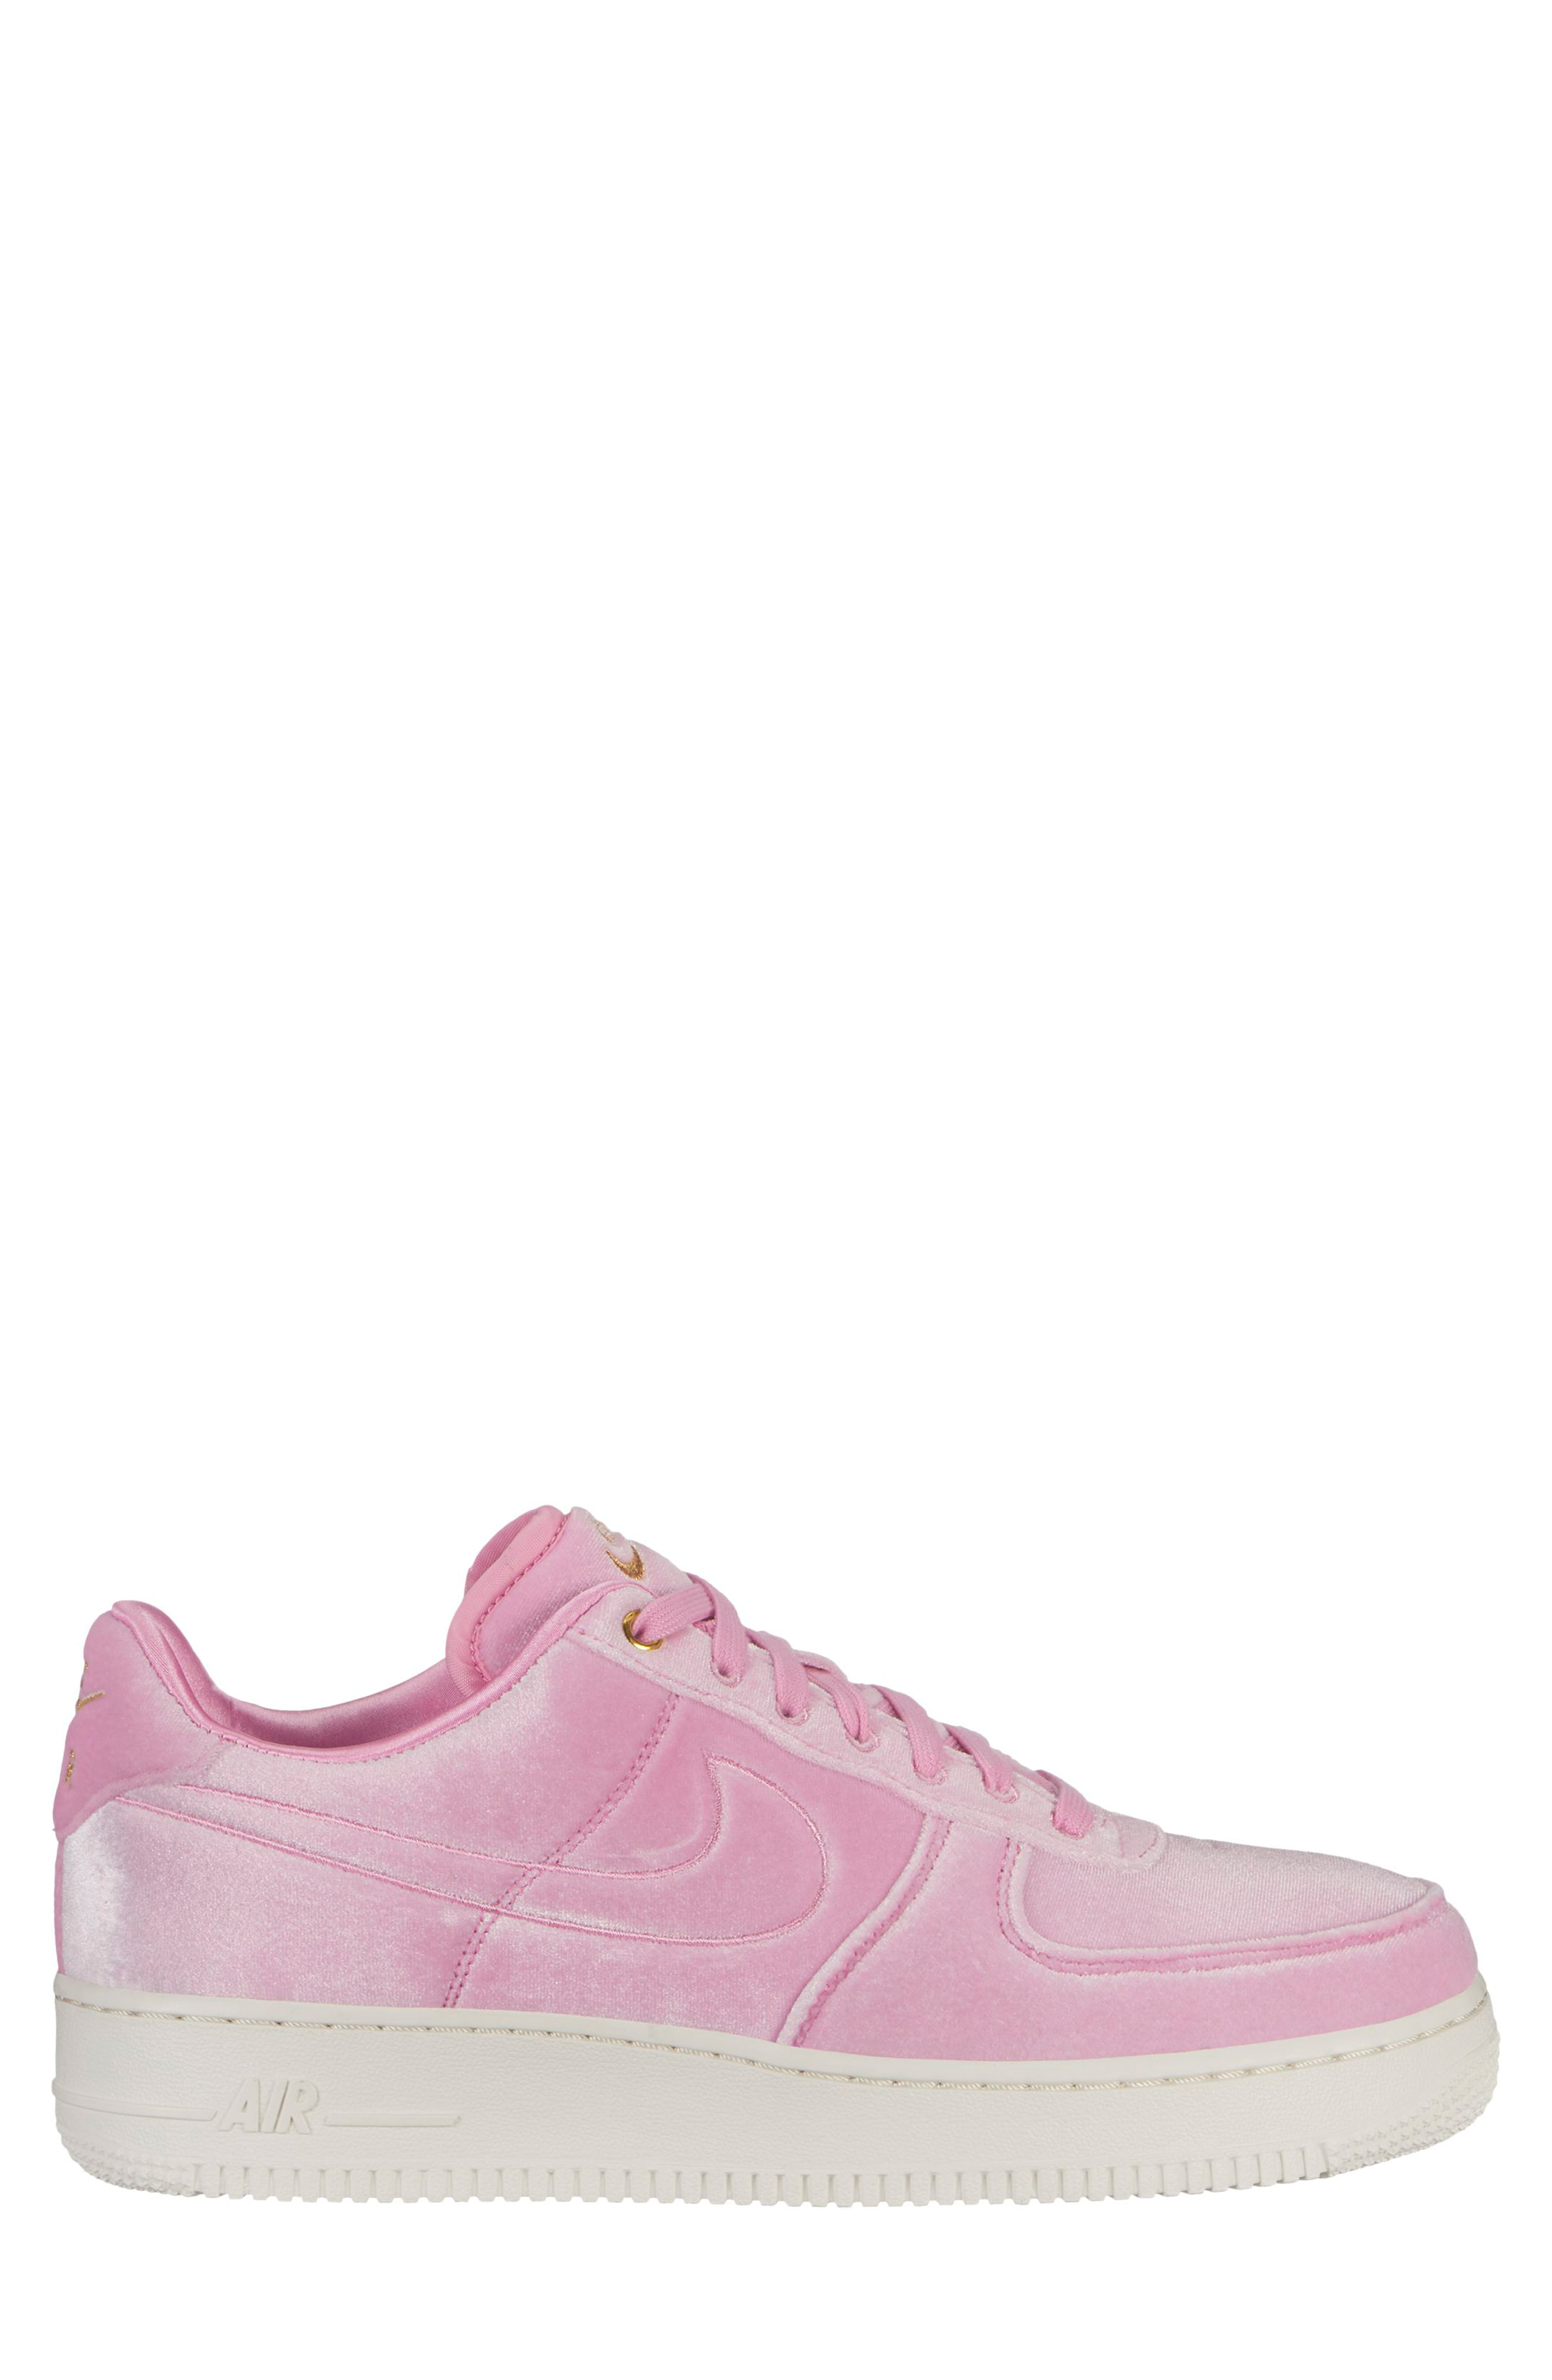 nike air force pink rise